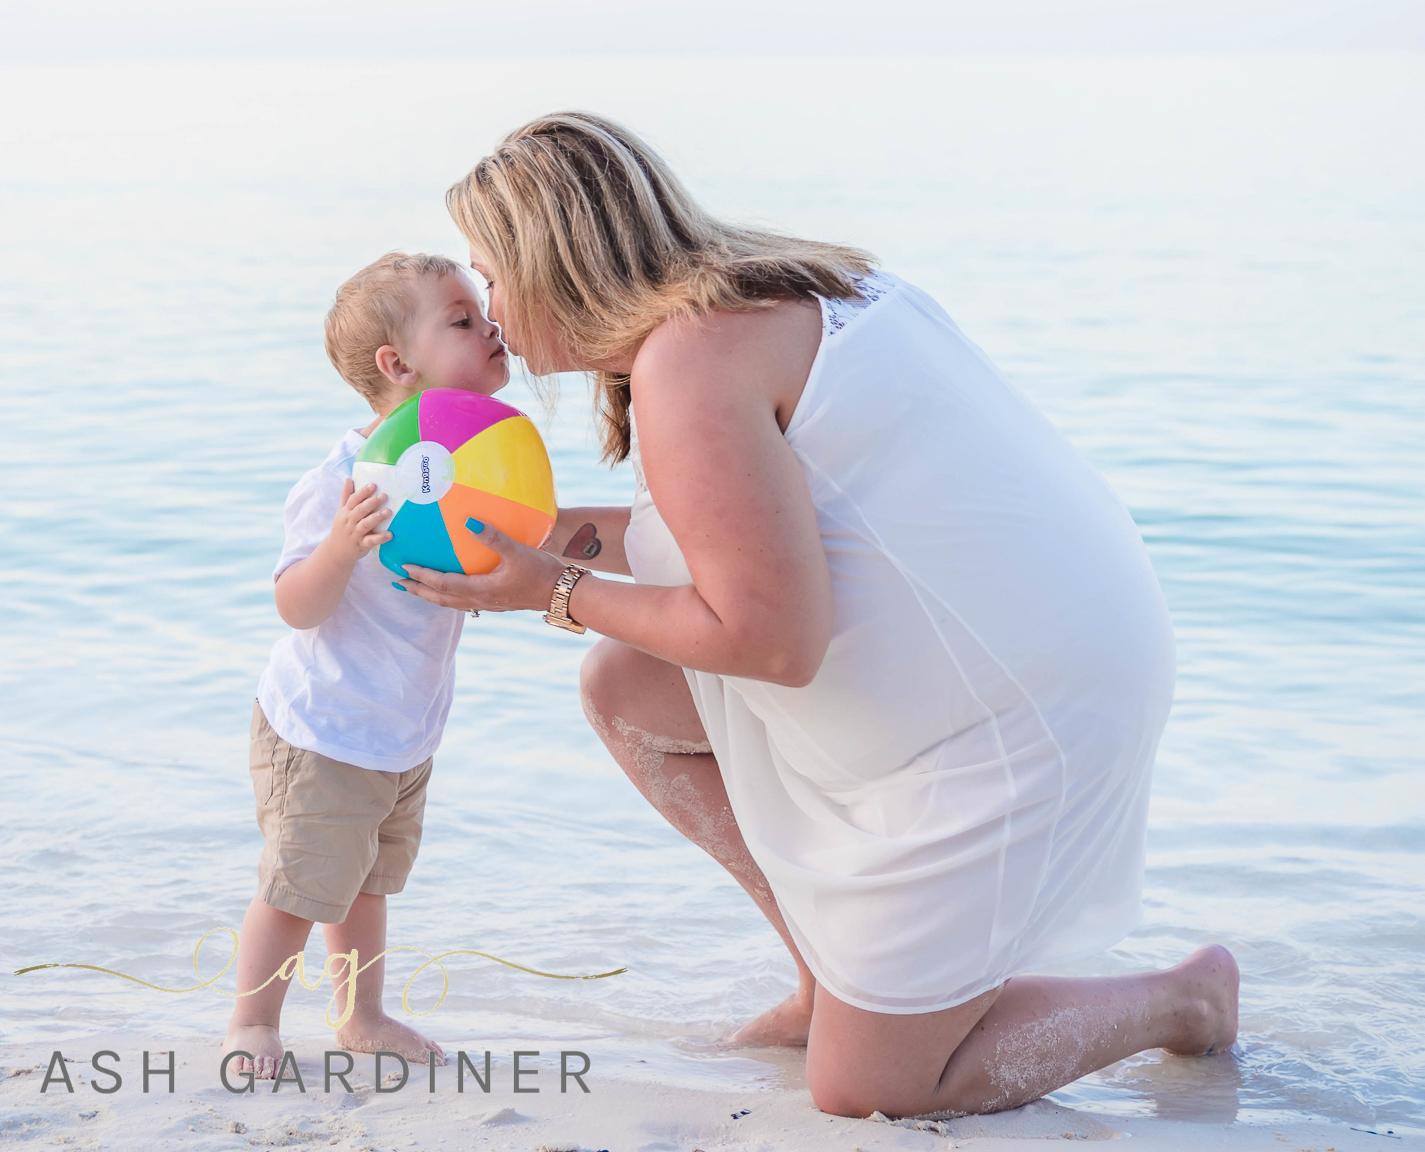 Ash Gardiner Photography